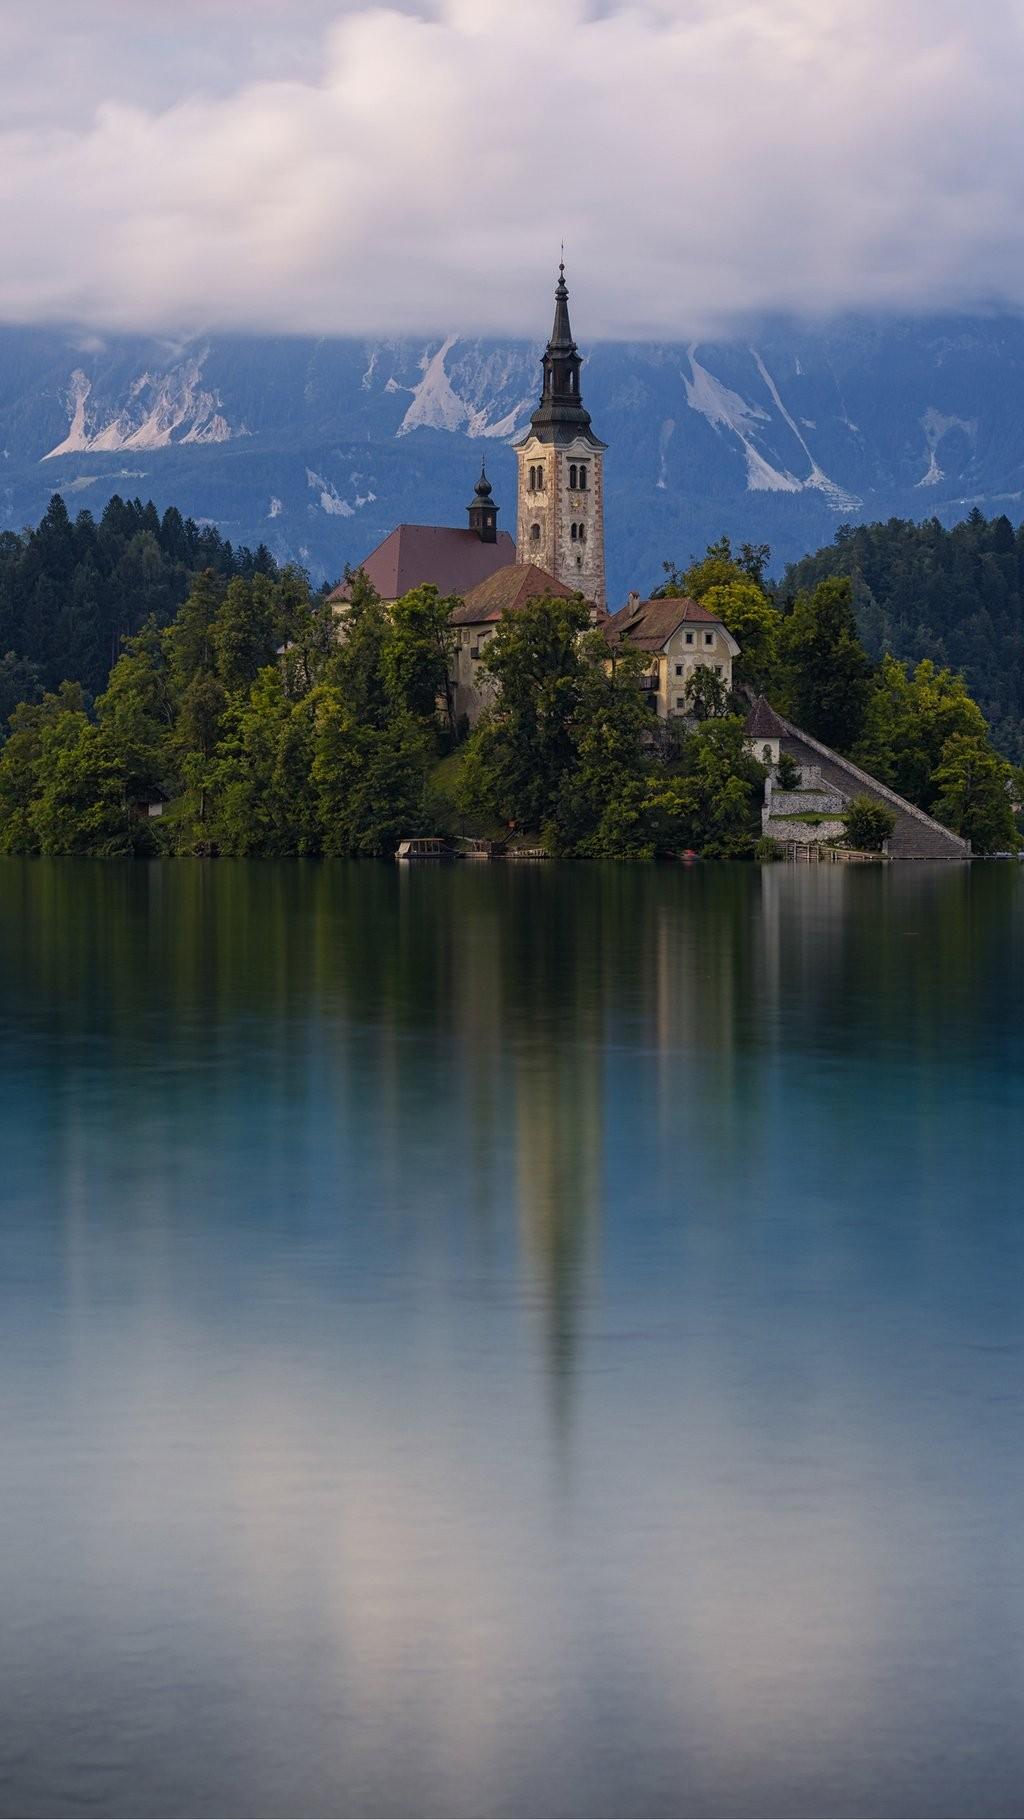 Beautiful Wallpaper Mountain Portrait - architecture_building_portrait_display_church_Slovenia_mountains_mist_lake-40232  You Should Have_591329.jpg!d